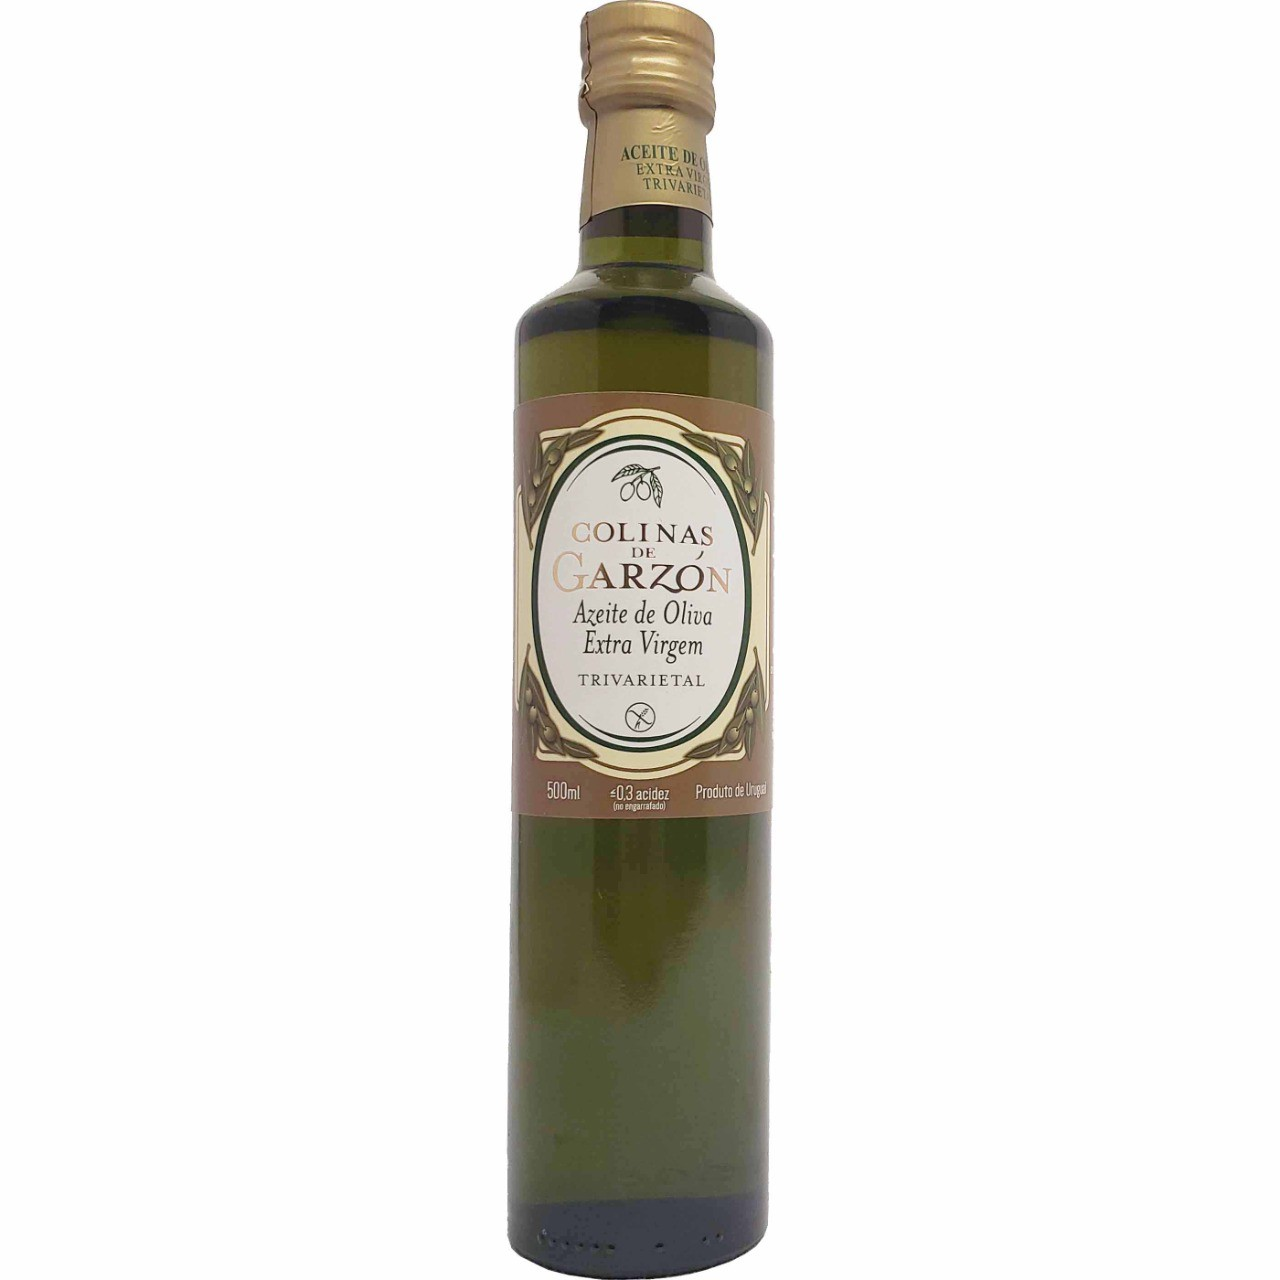 Azeite de Oliva Extra Virgem Trivarietal Colinas de Garzón - 500ml -